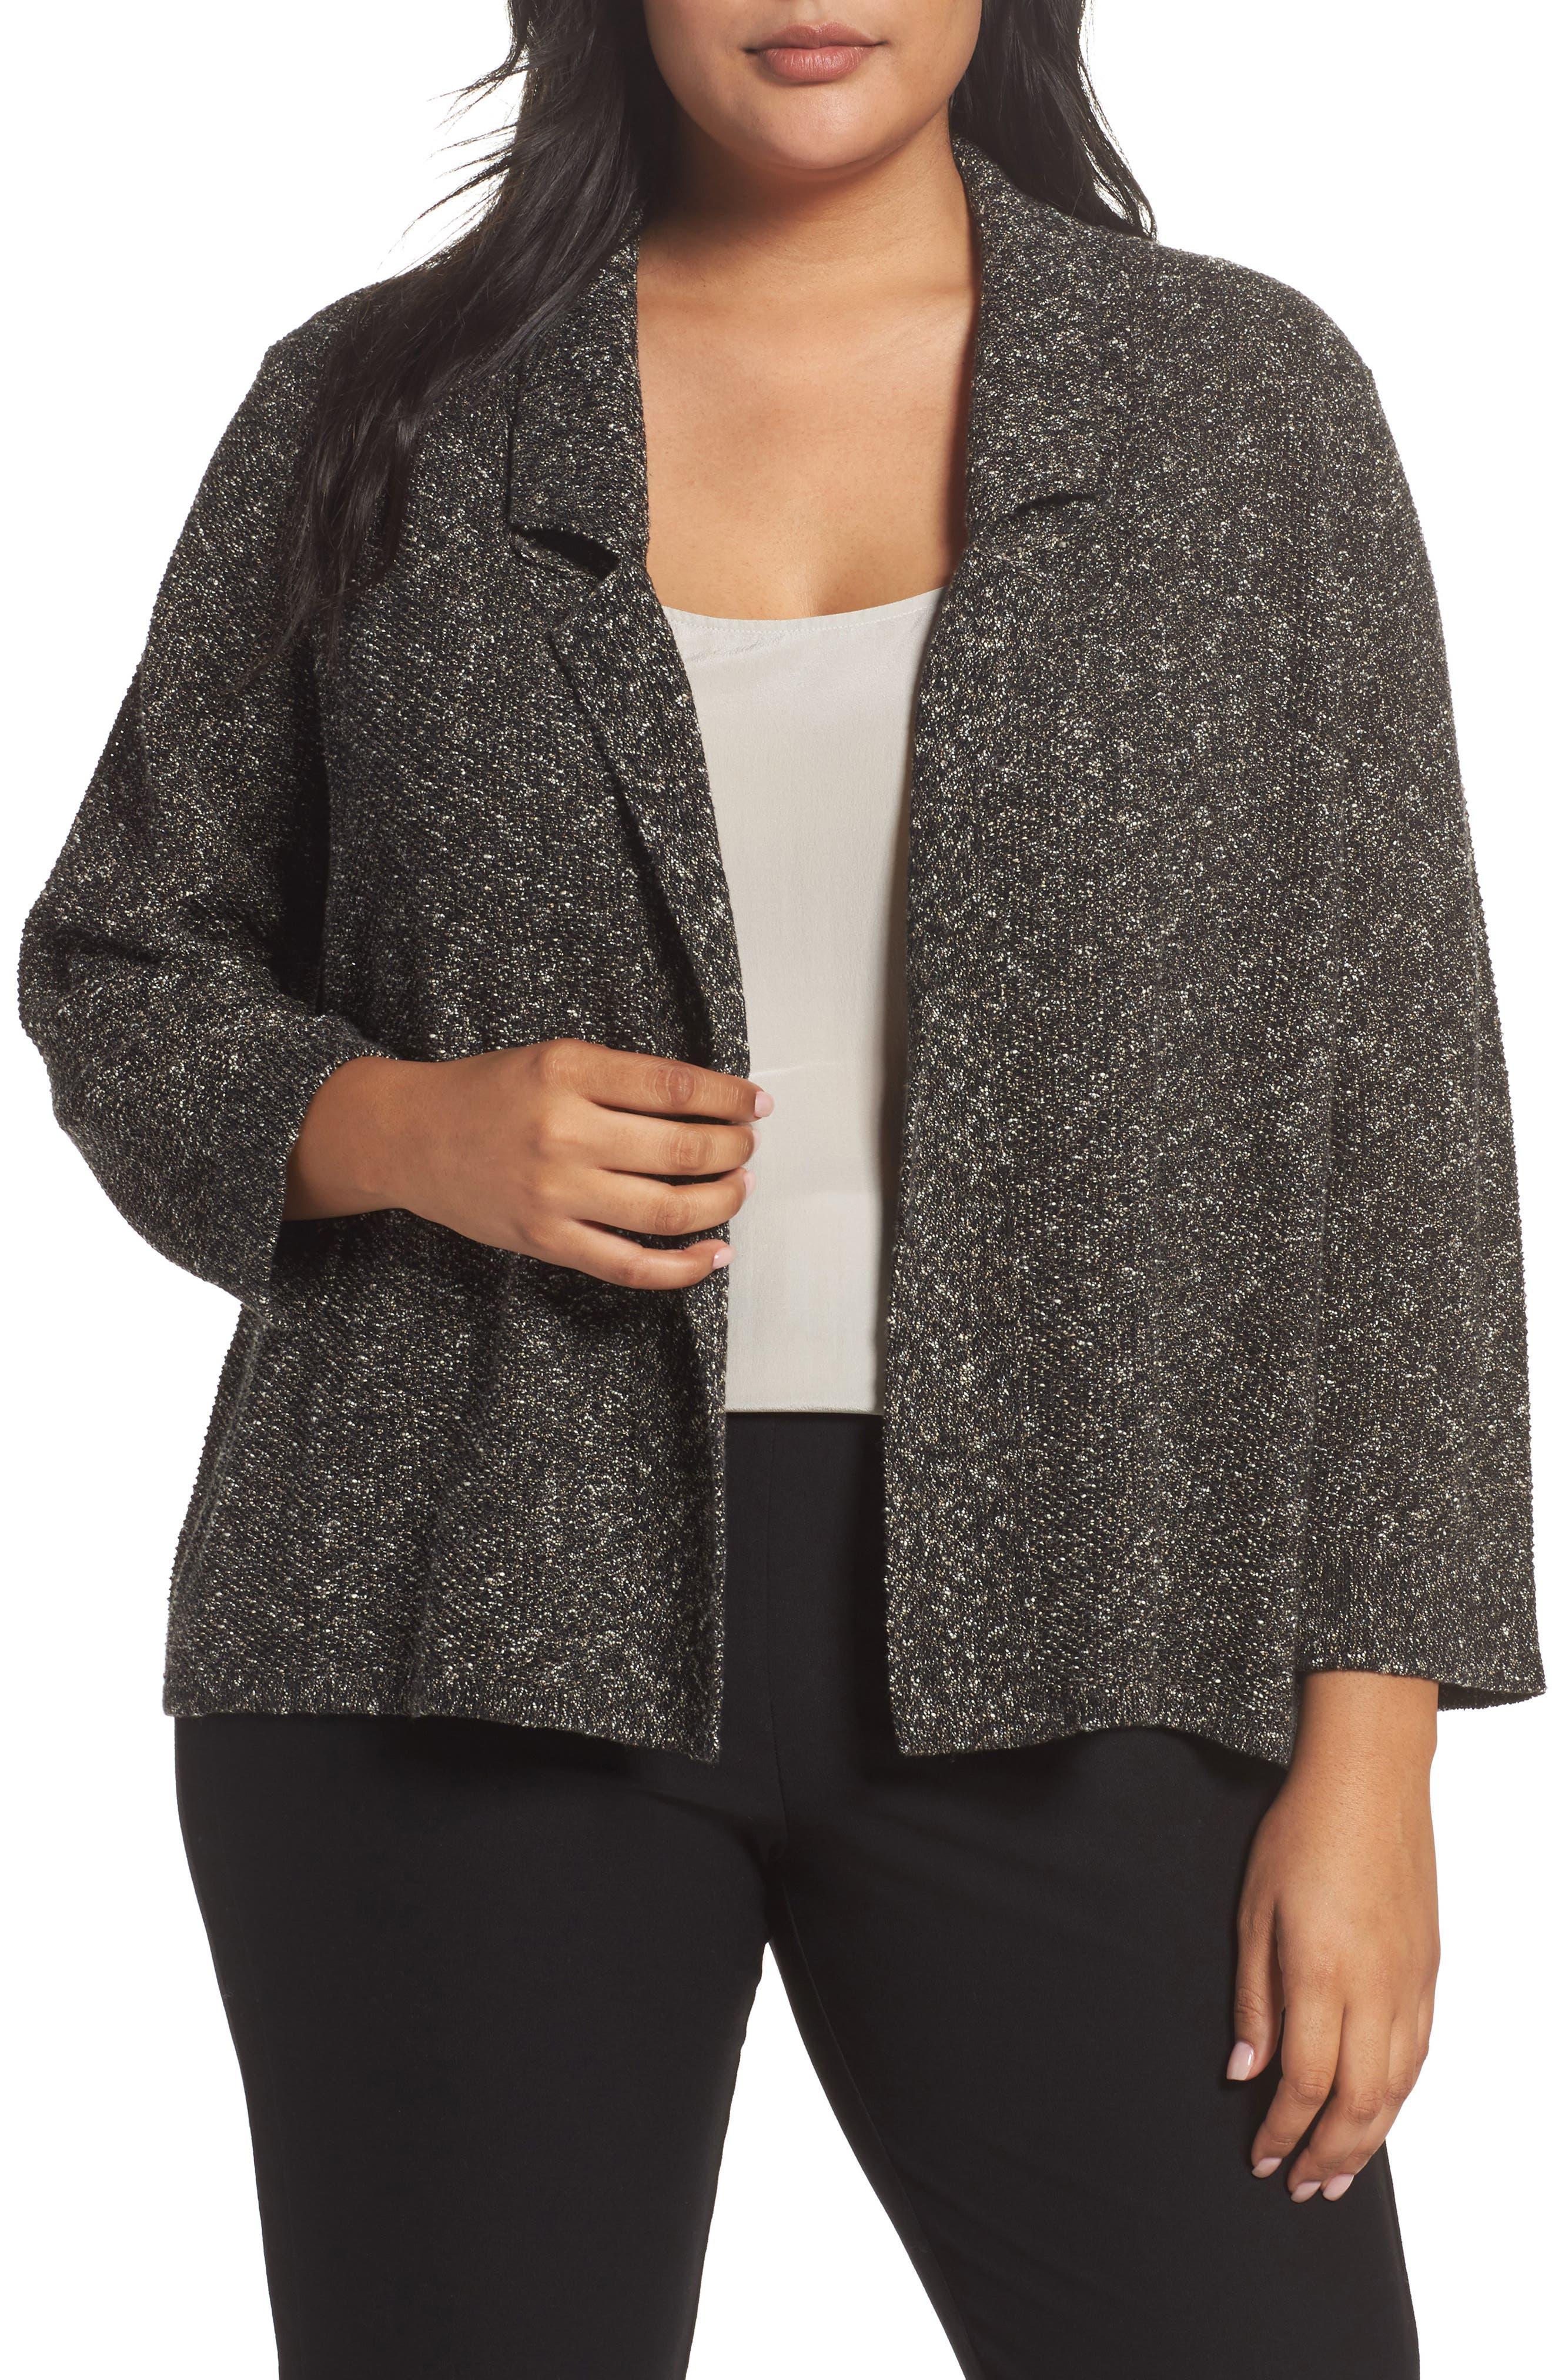 Organic Cotton Blend Sweater Jacket,                             Main thumbnail 1, color,                             Black